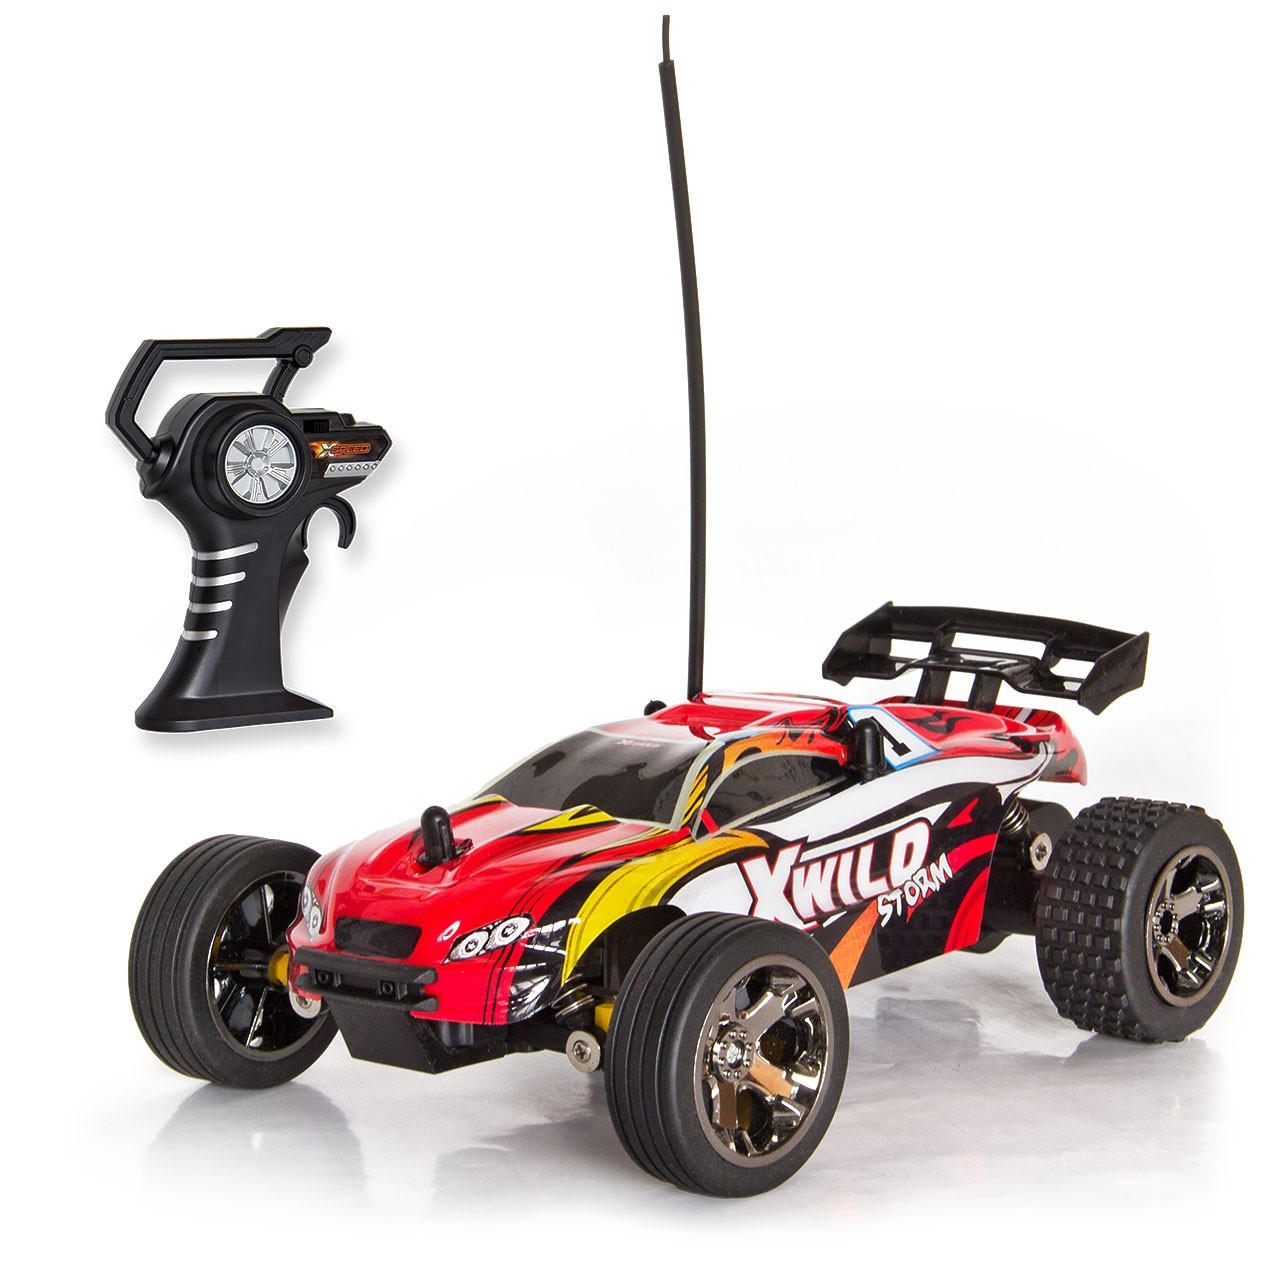 Wild-Storm RC Car